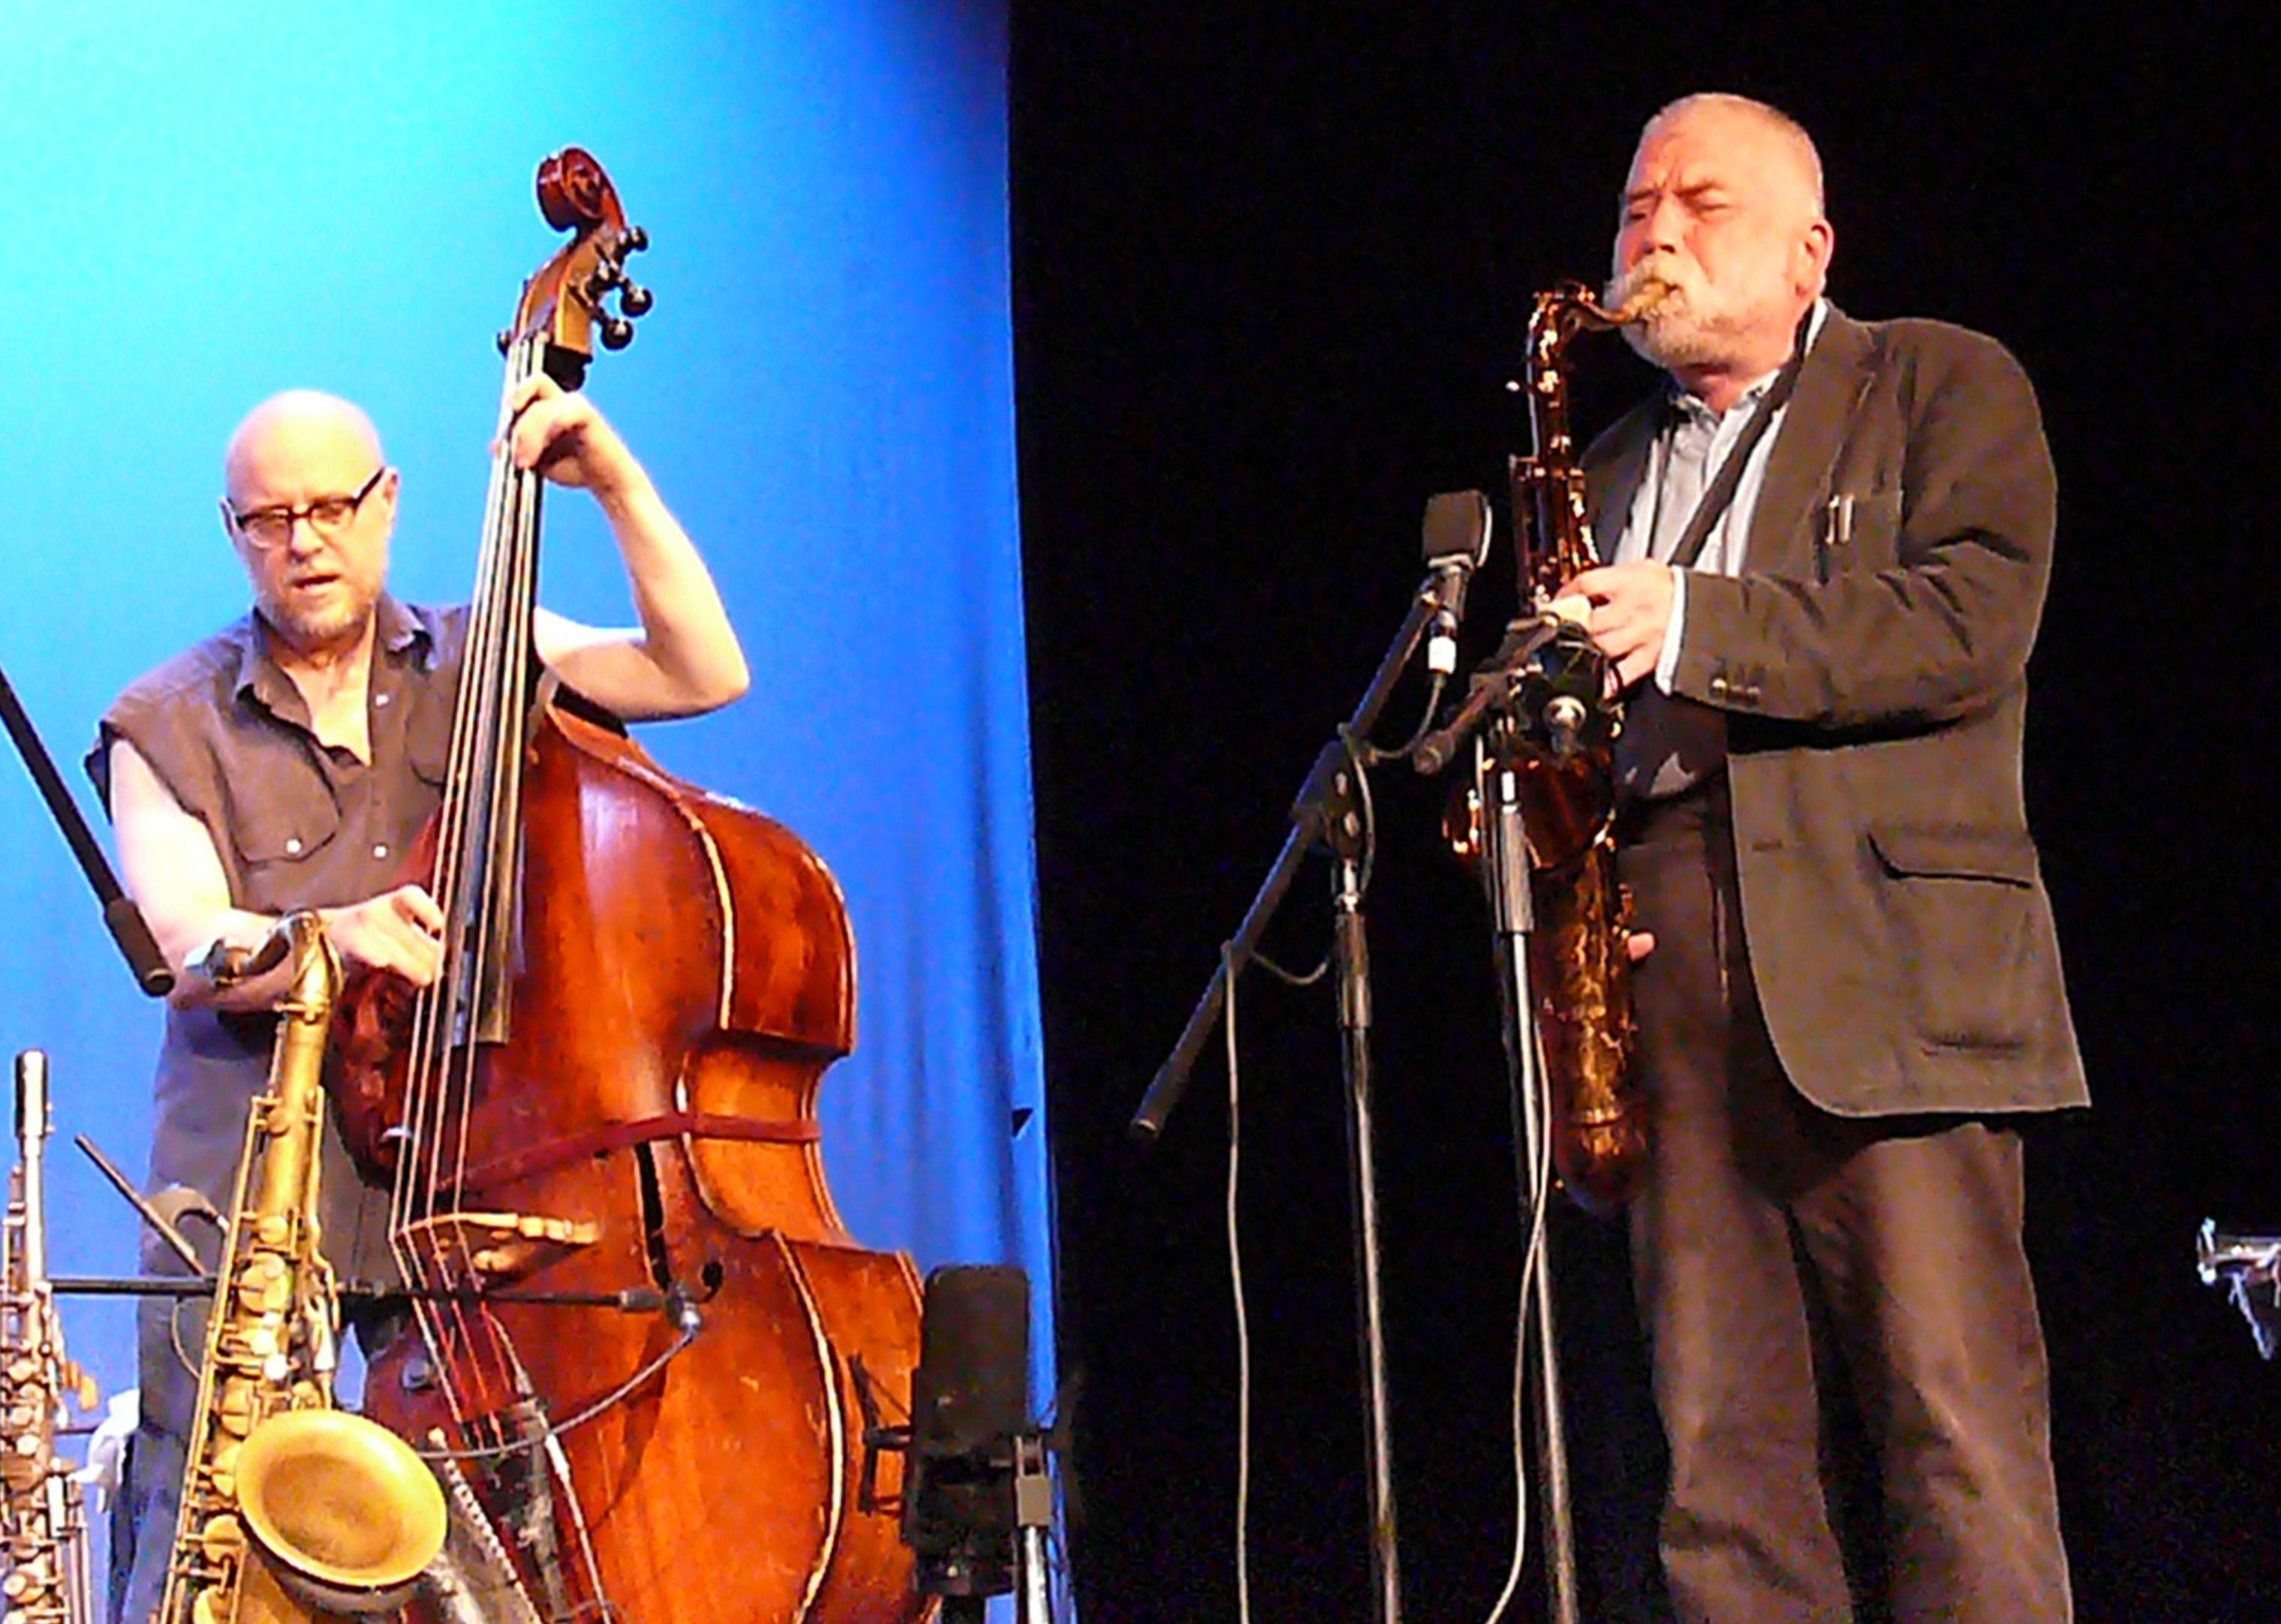 Kent Kessler and Peter Brotzmann at Vision Festival 2011